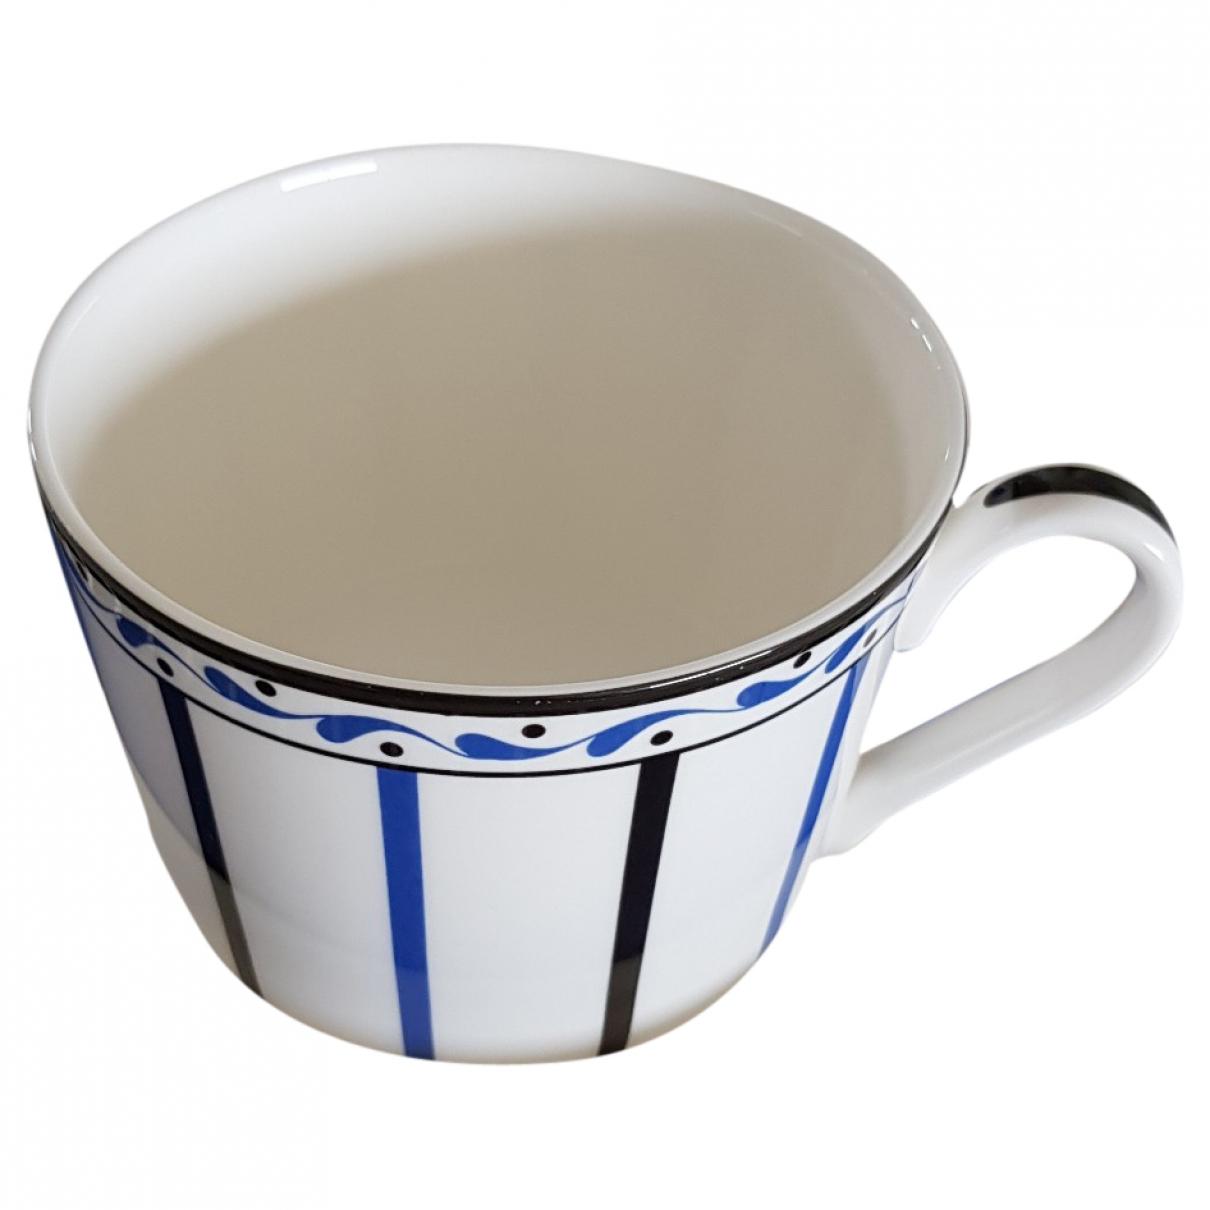 Juego de te/cafe de Porcelana Dior